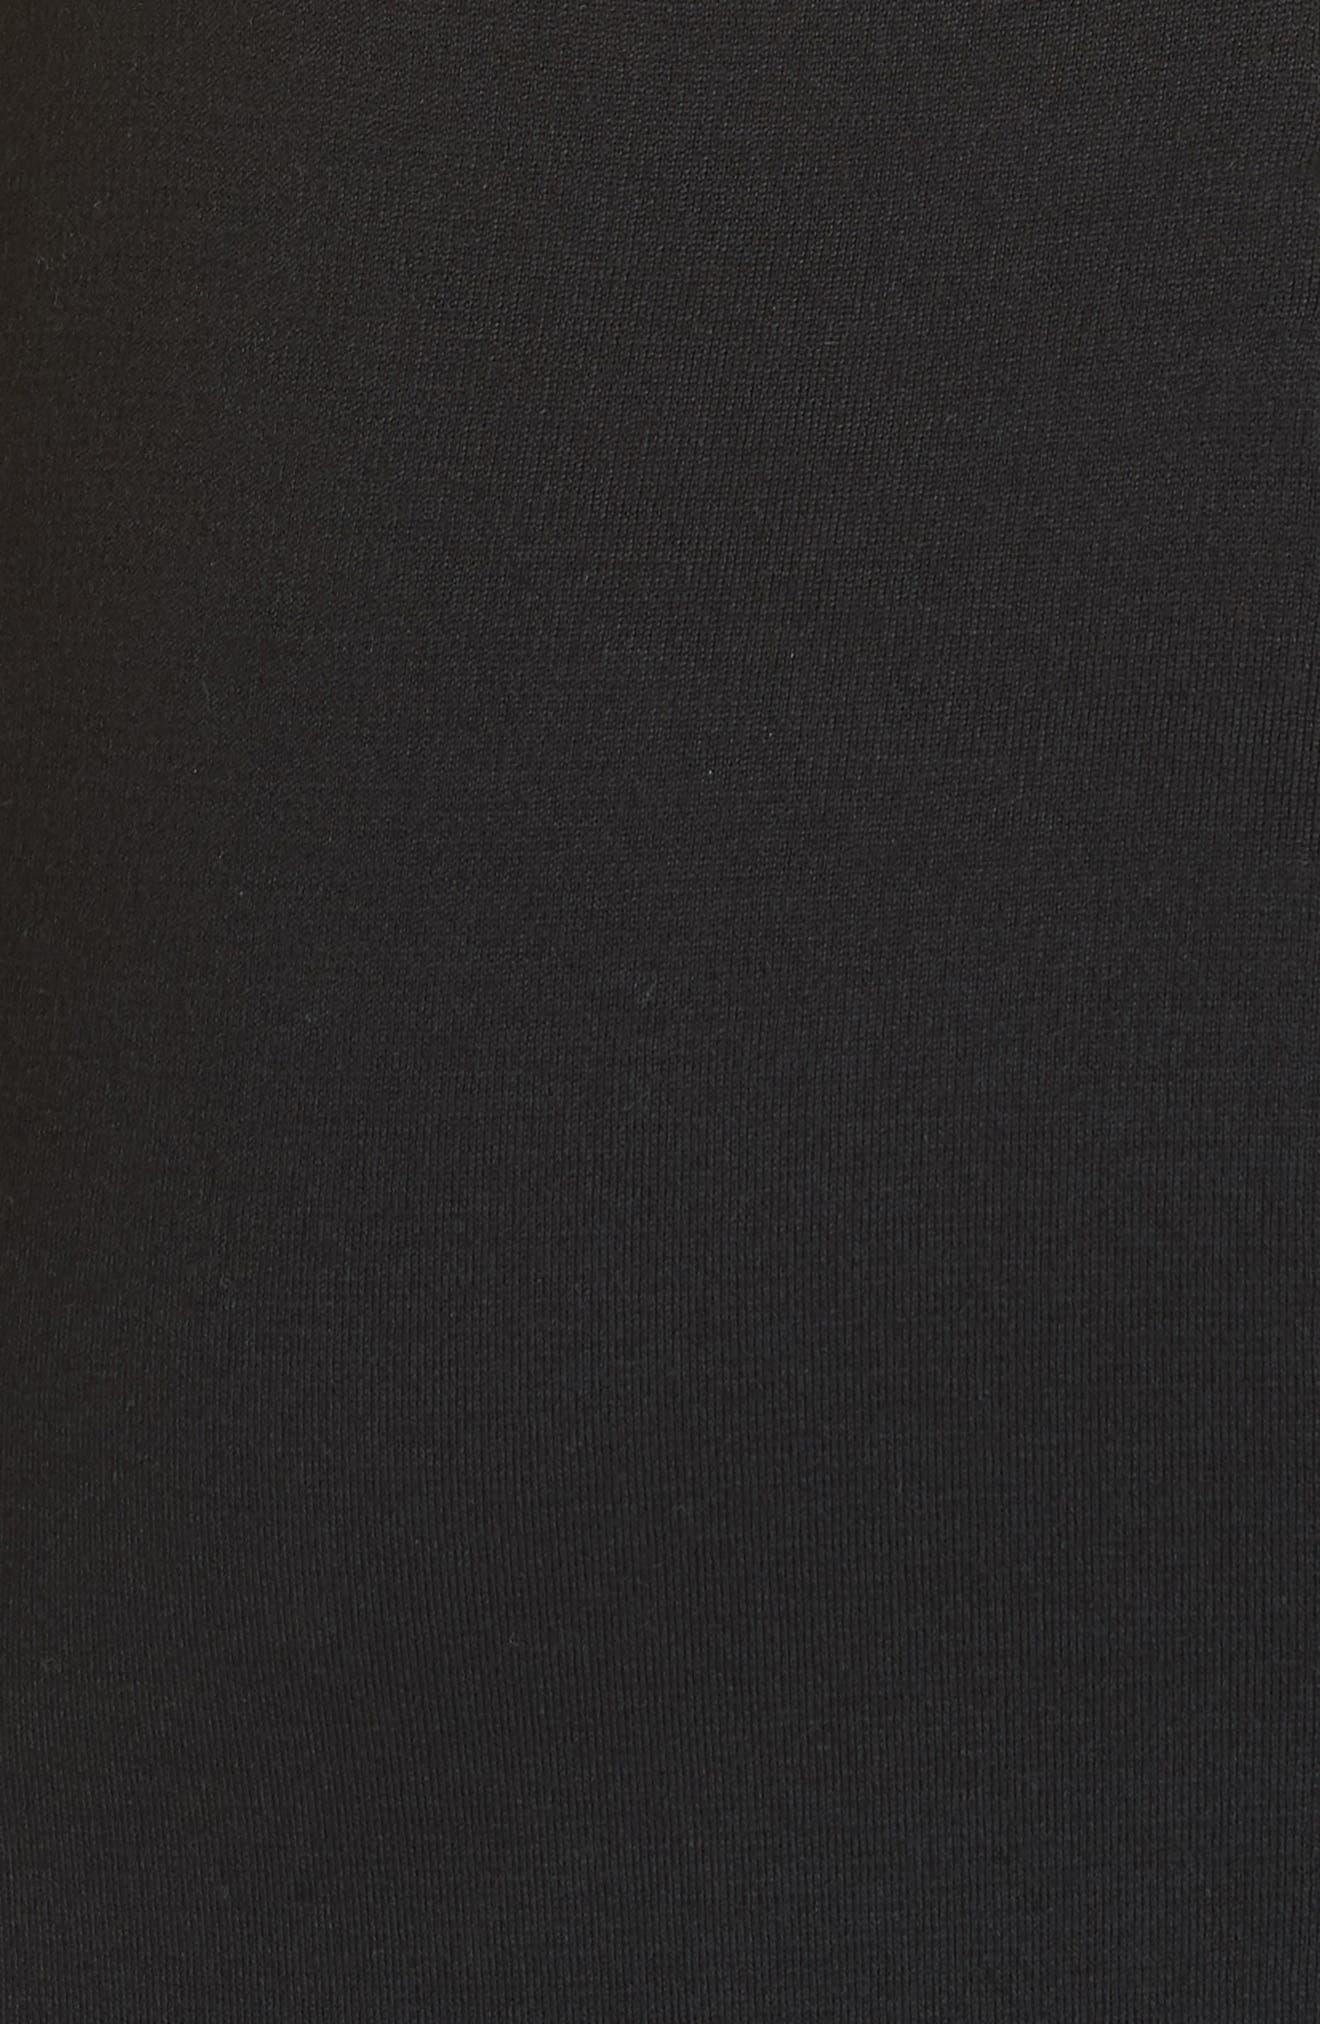 ST. JOHN COLLECTION,                             Sleeveless Milano Knit Dress,                             Alternate thumbnail 5, color,                             CAVIAR